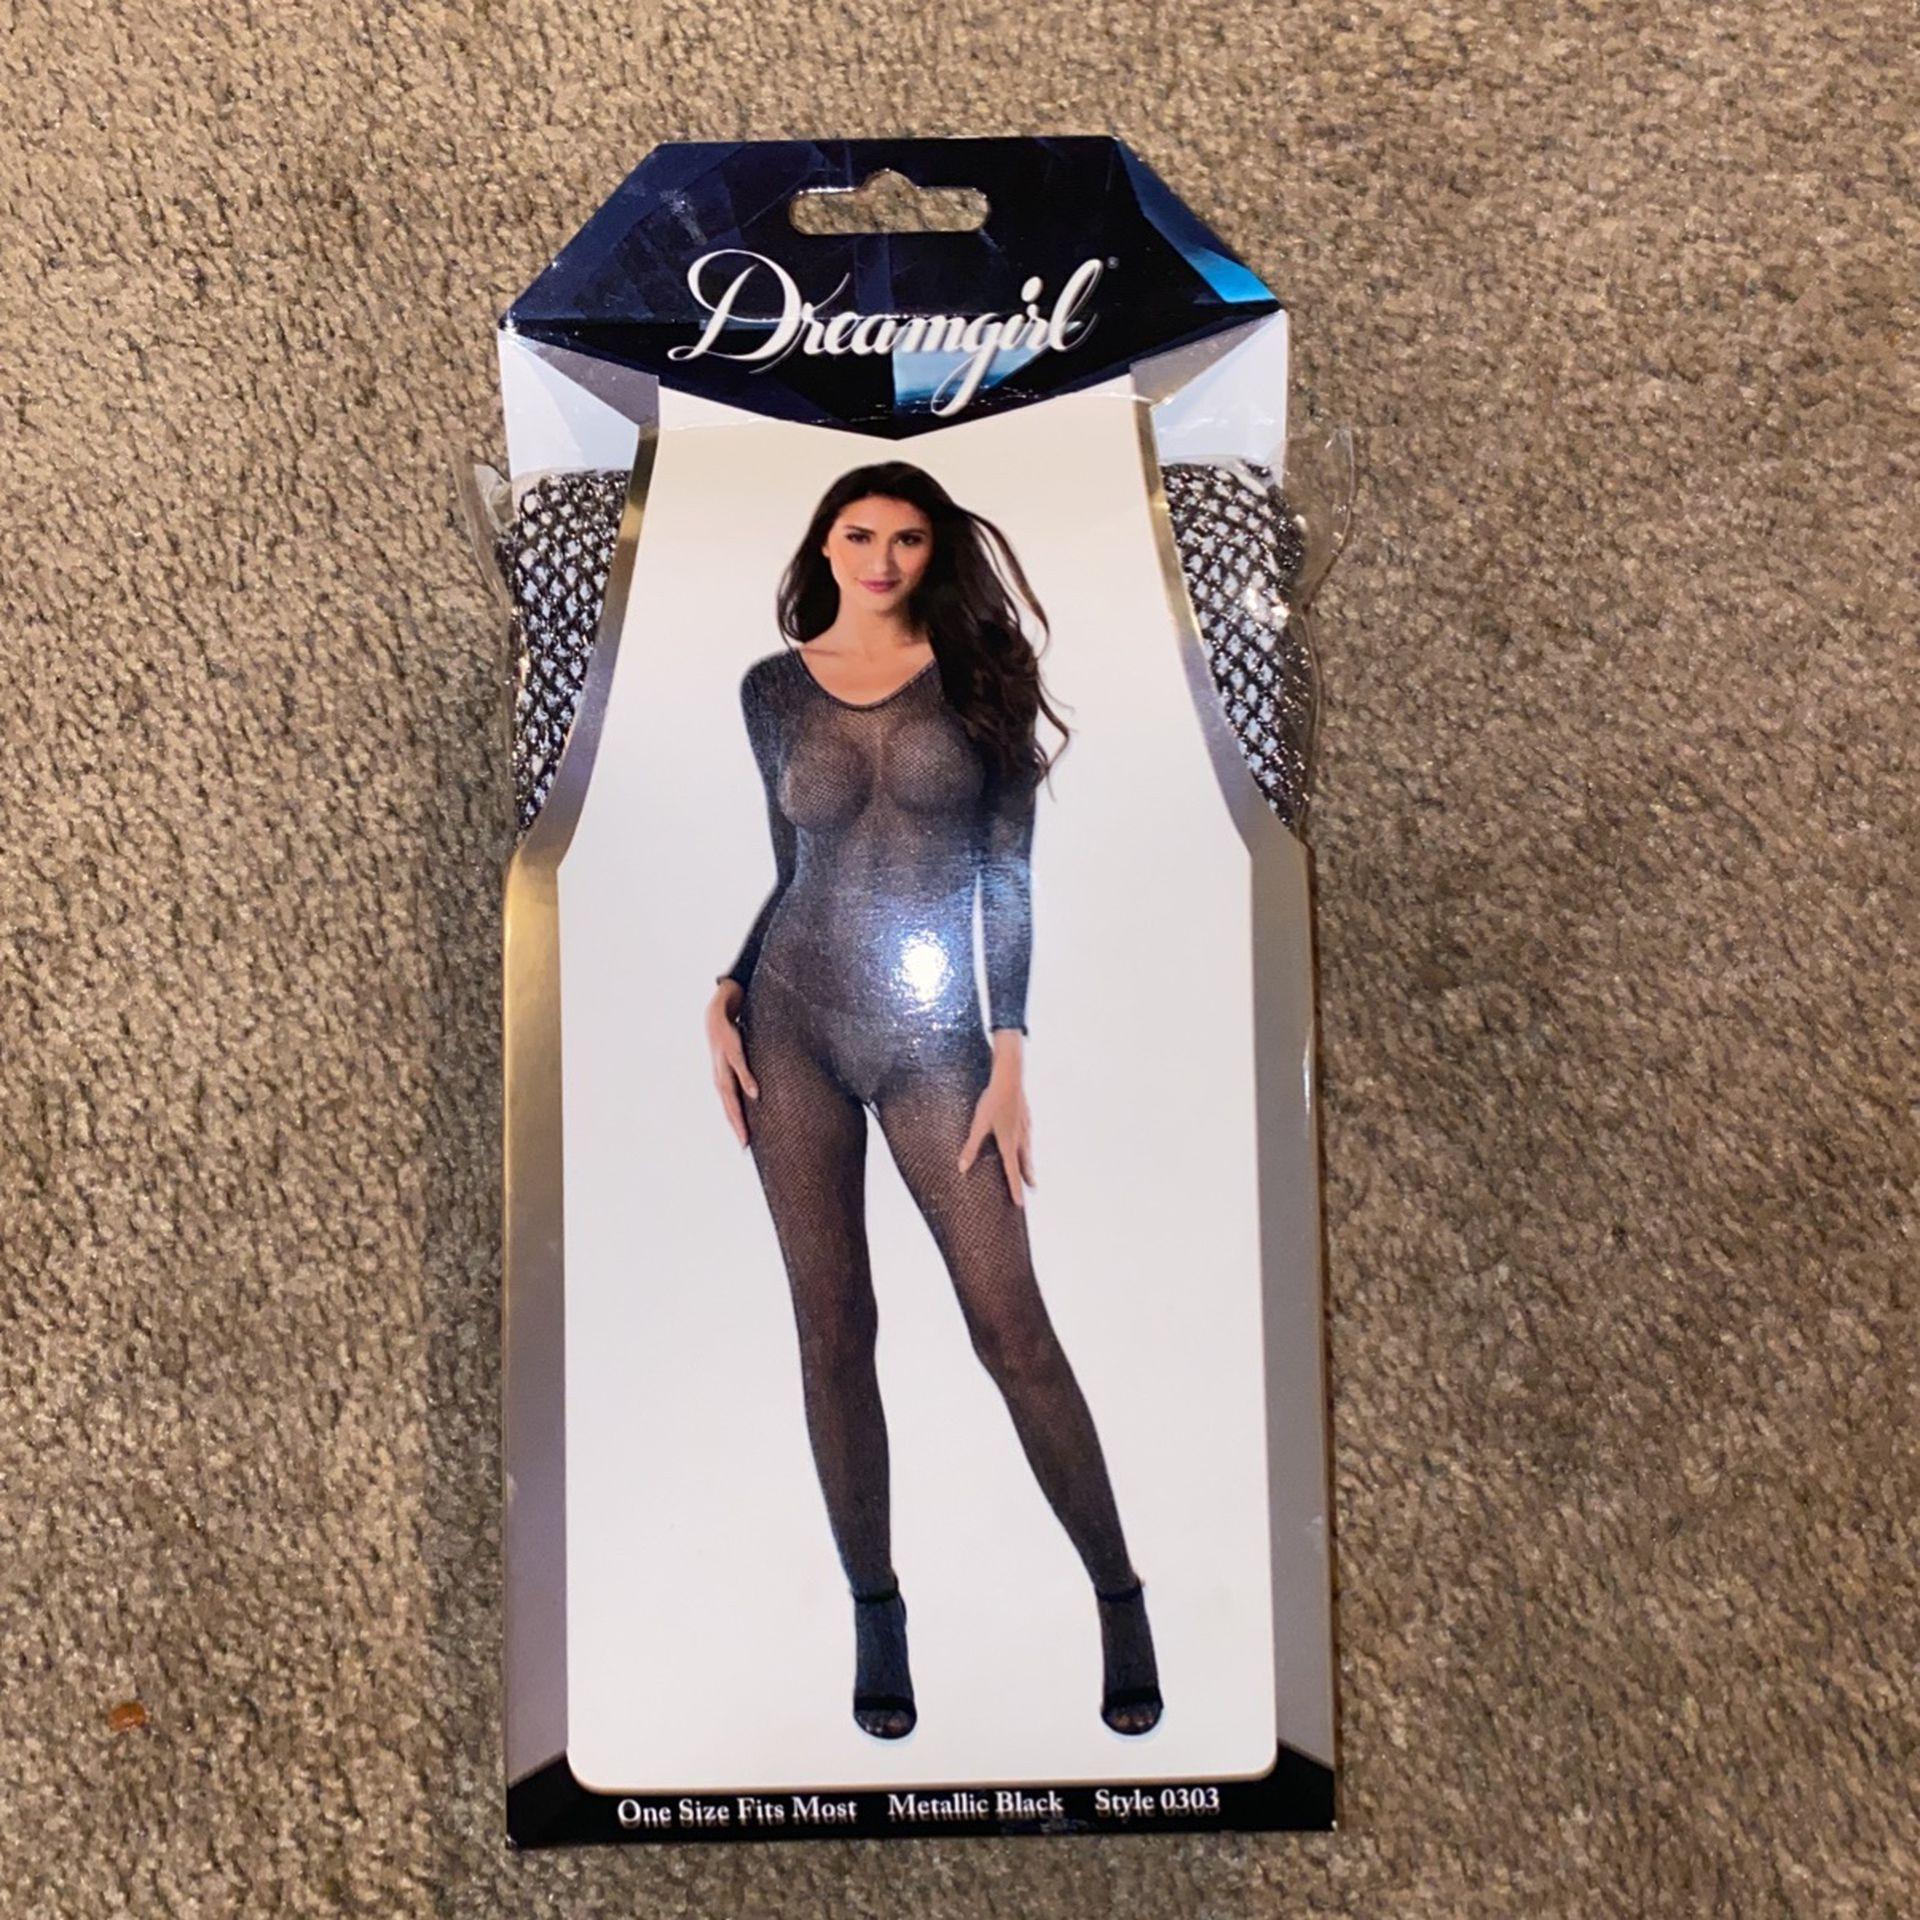 Stocking bodysuit